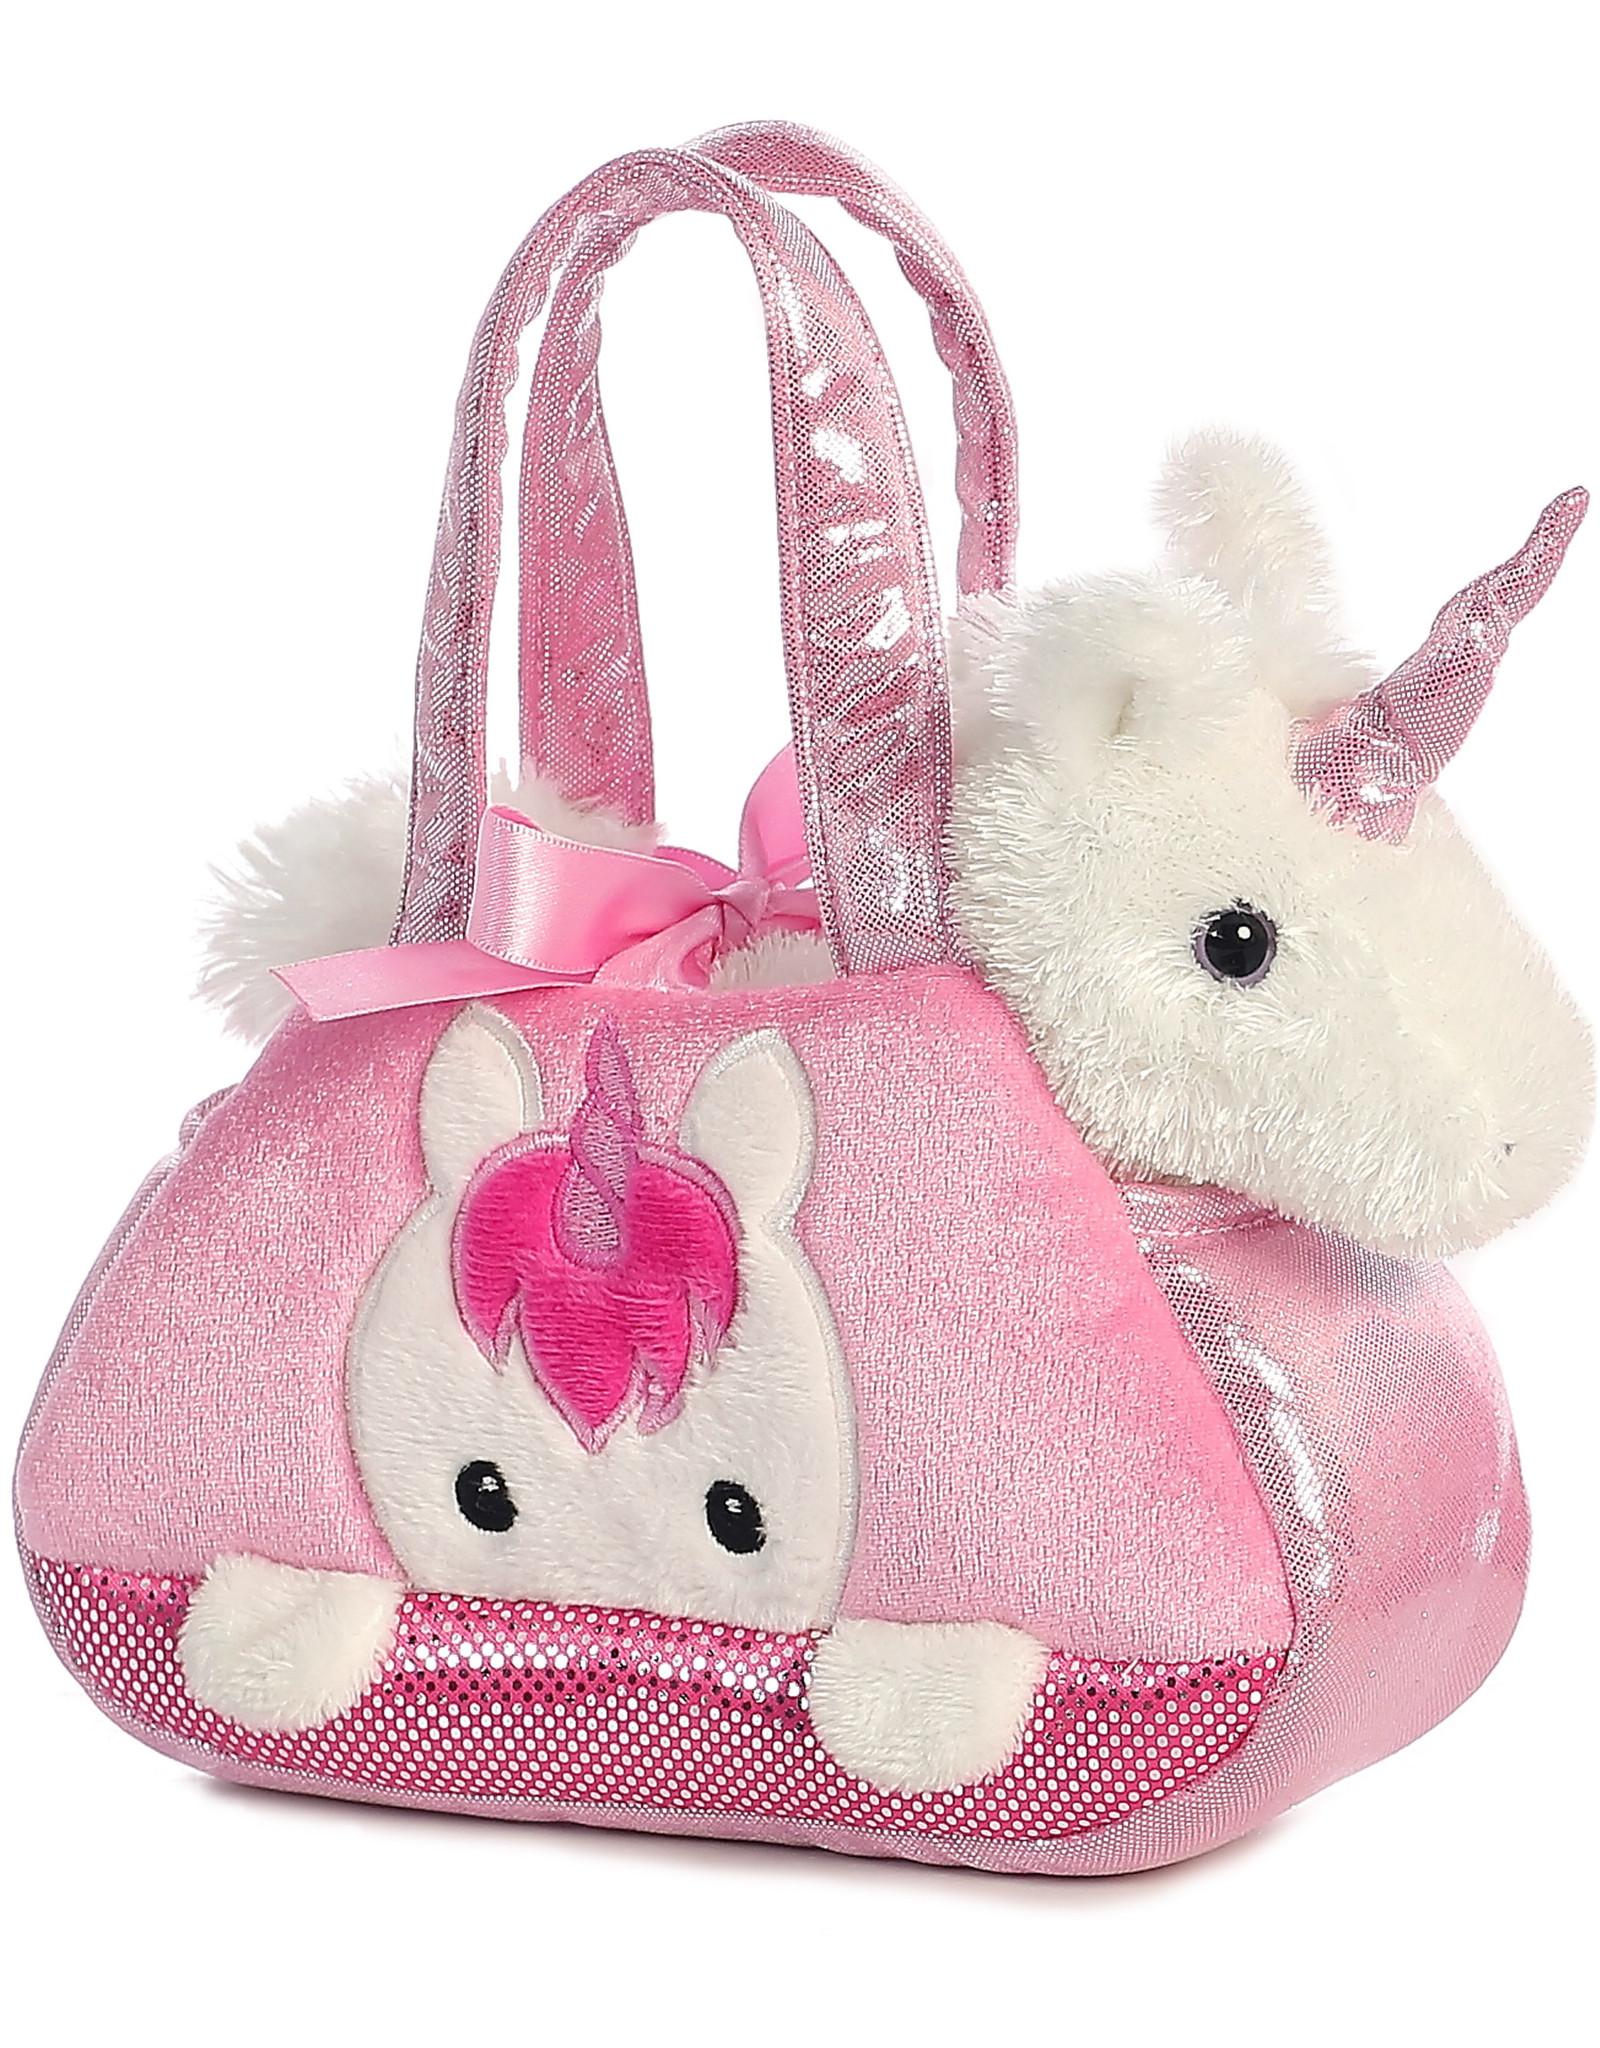 La Licornerie Pink Plush Handbag with its unicorn